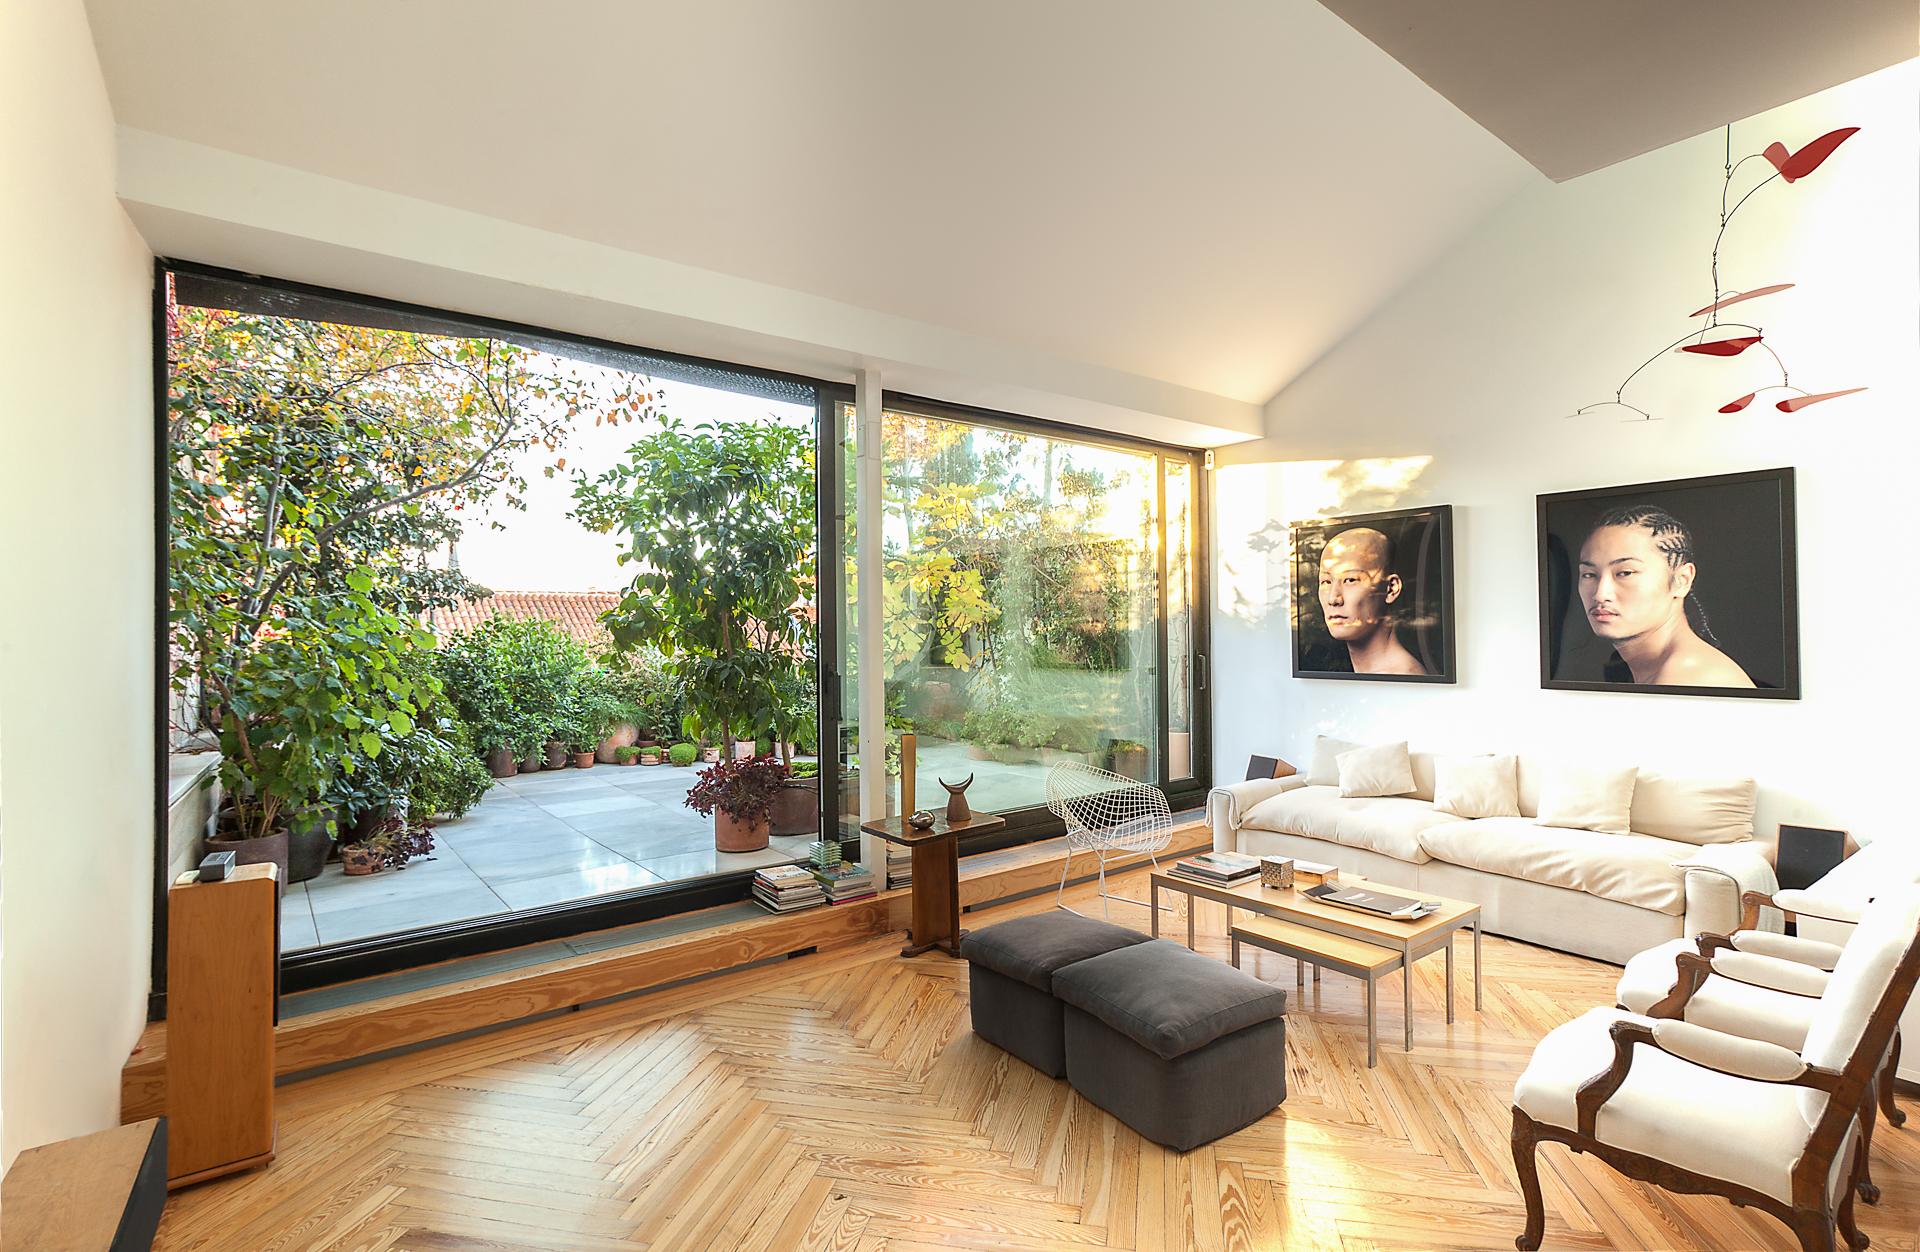 VALVERDE_Maroto_Ibañez_arquitectos01